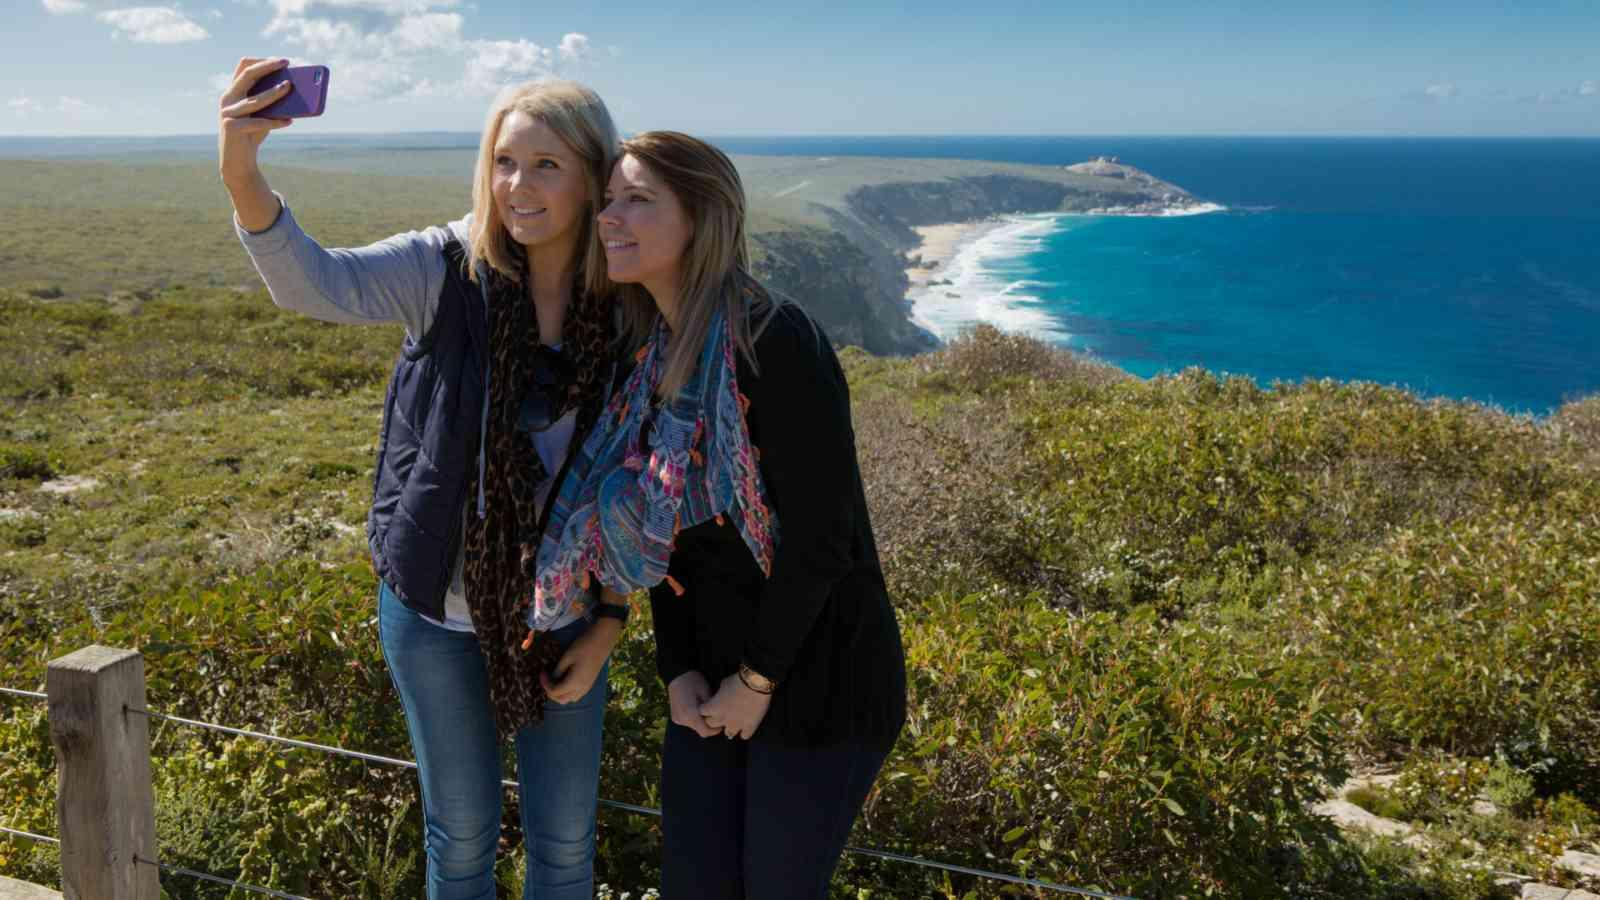 Kangaroo Island Selfie